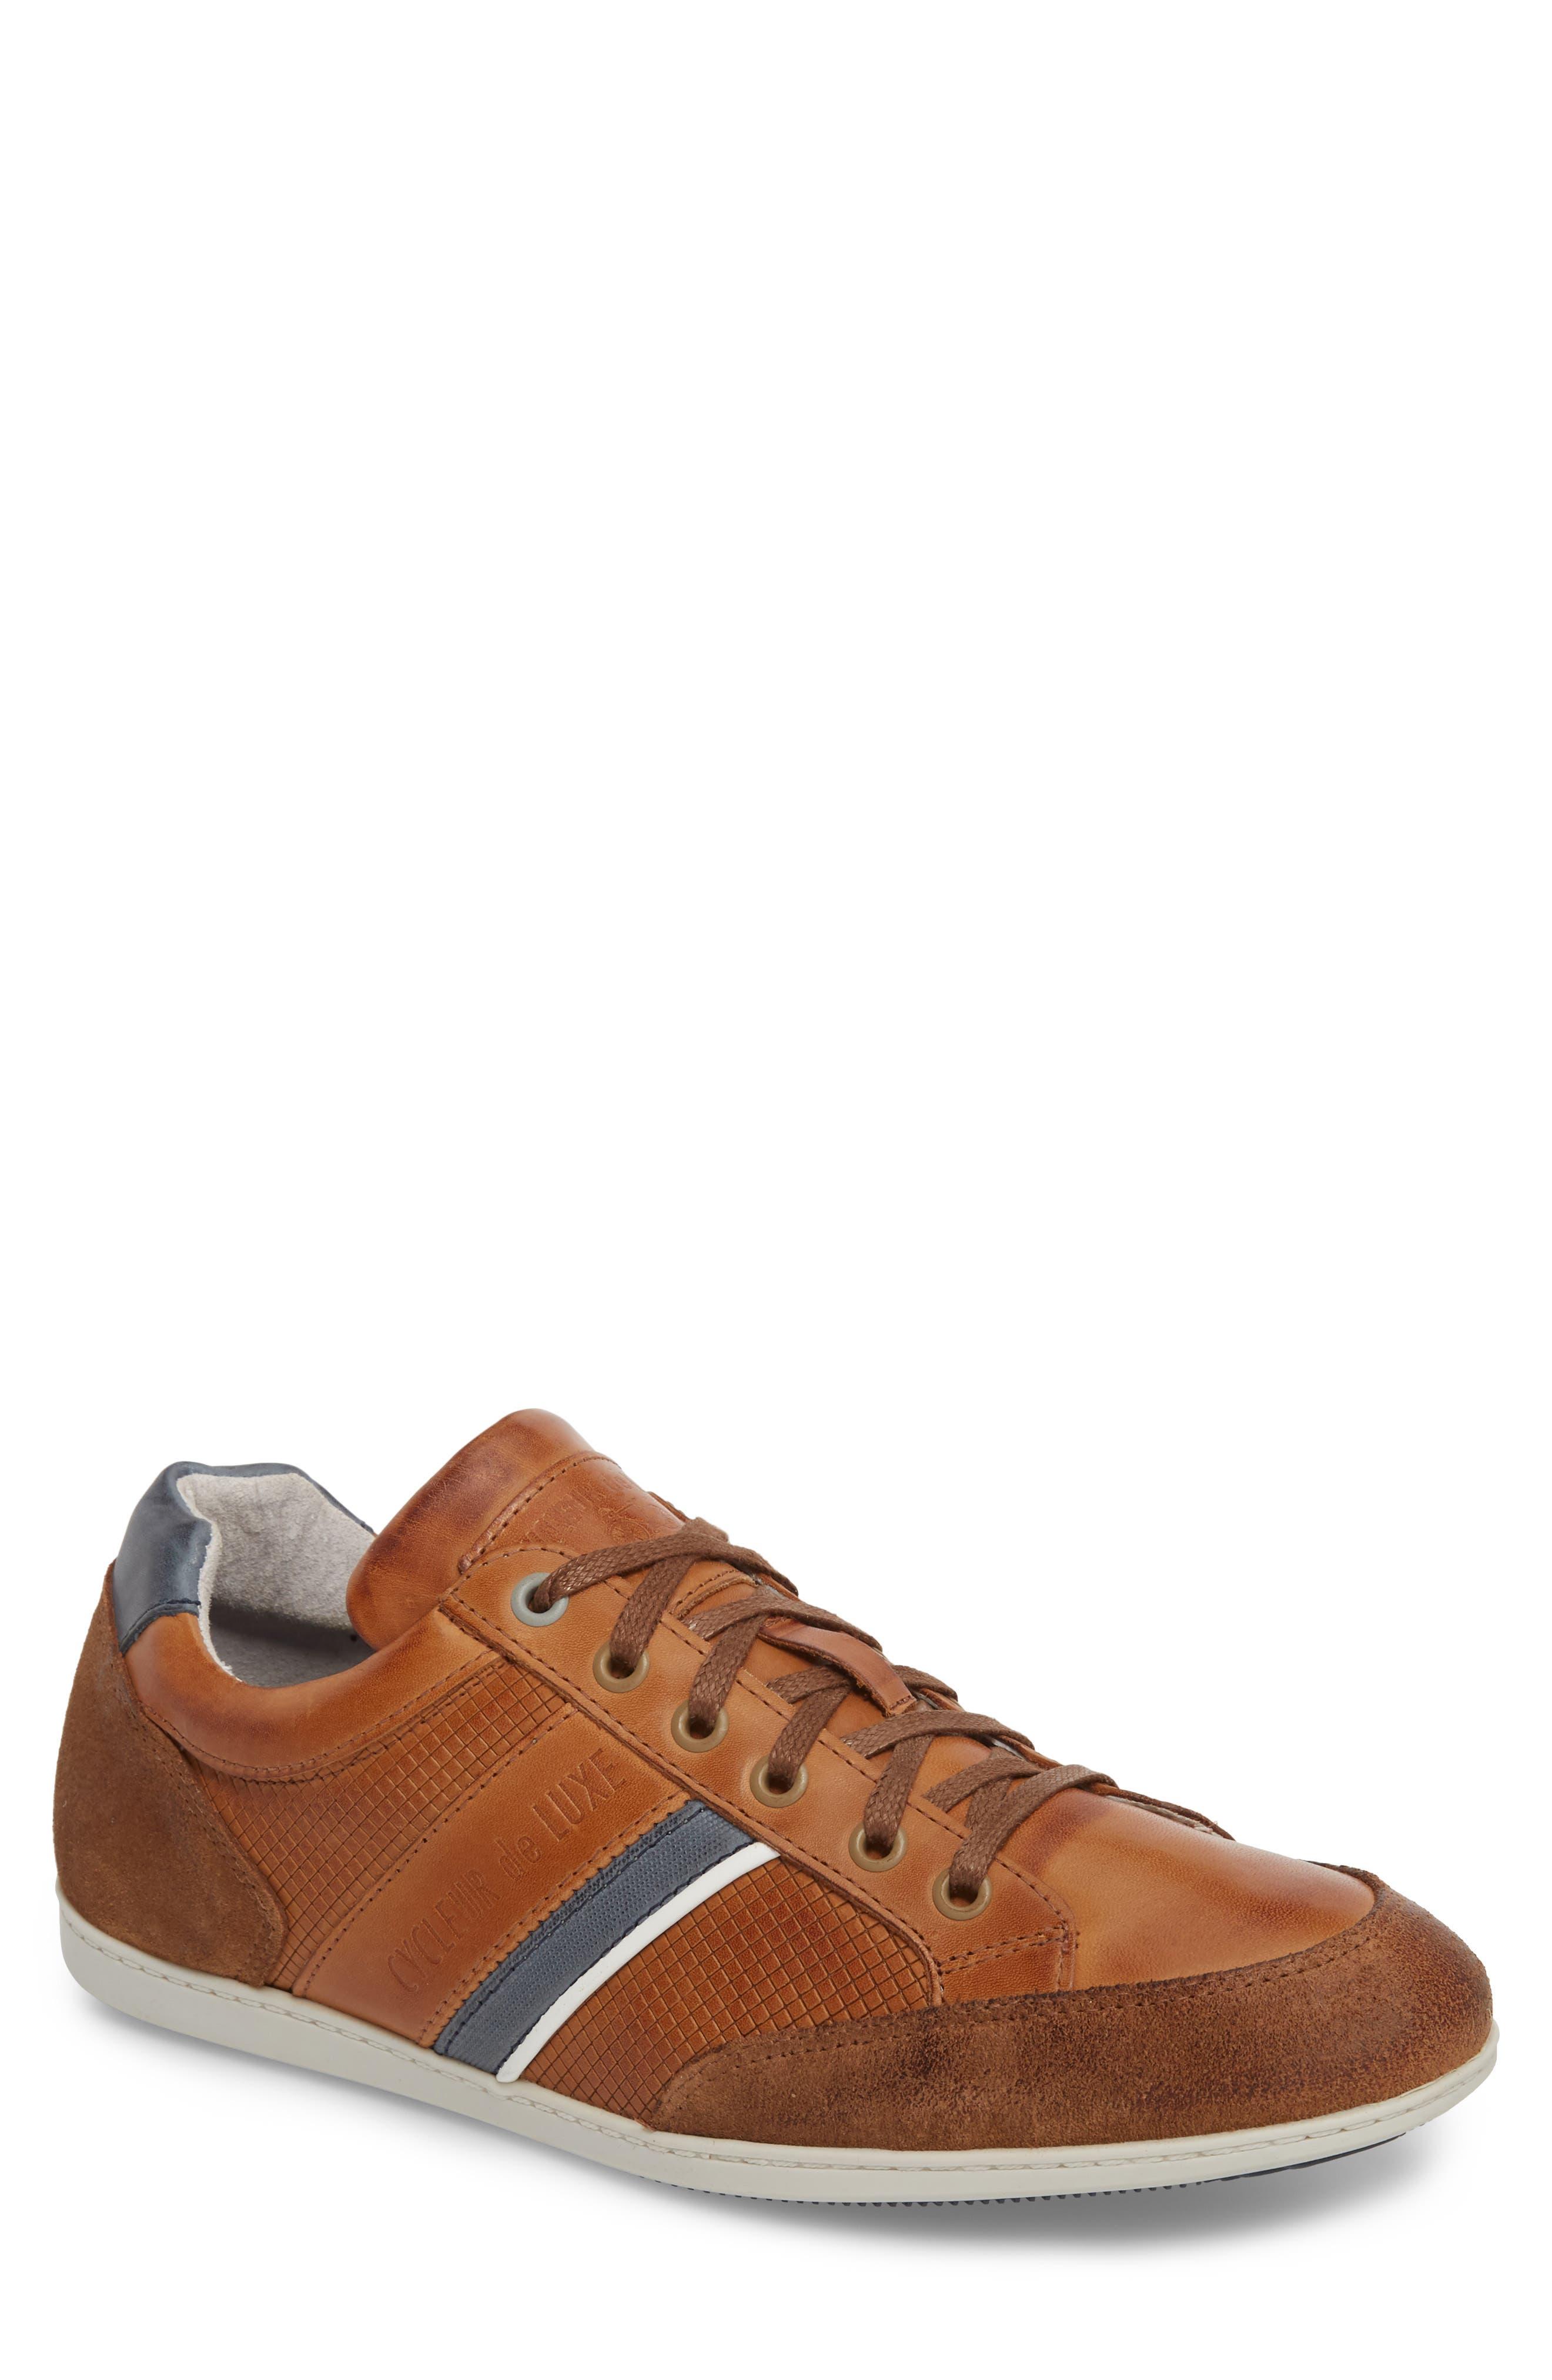 Bahamas Low Top Sneaker,                             Main thumbnail 1, color,                             COGNAC LEATHER